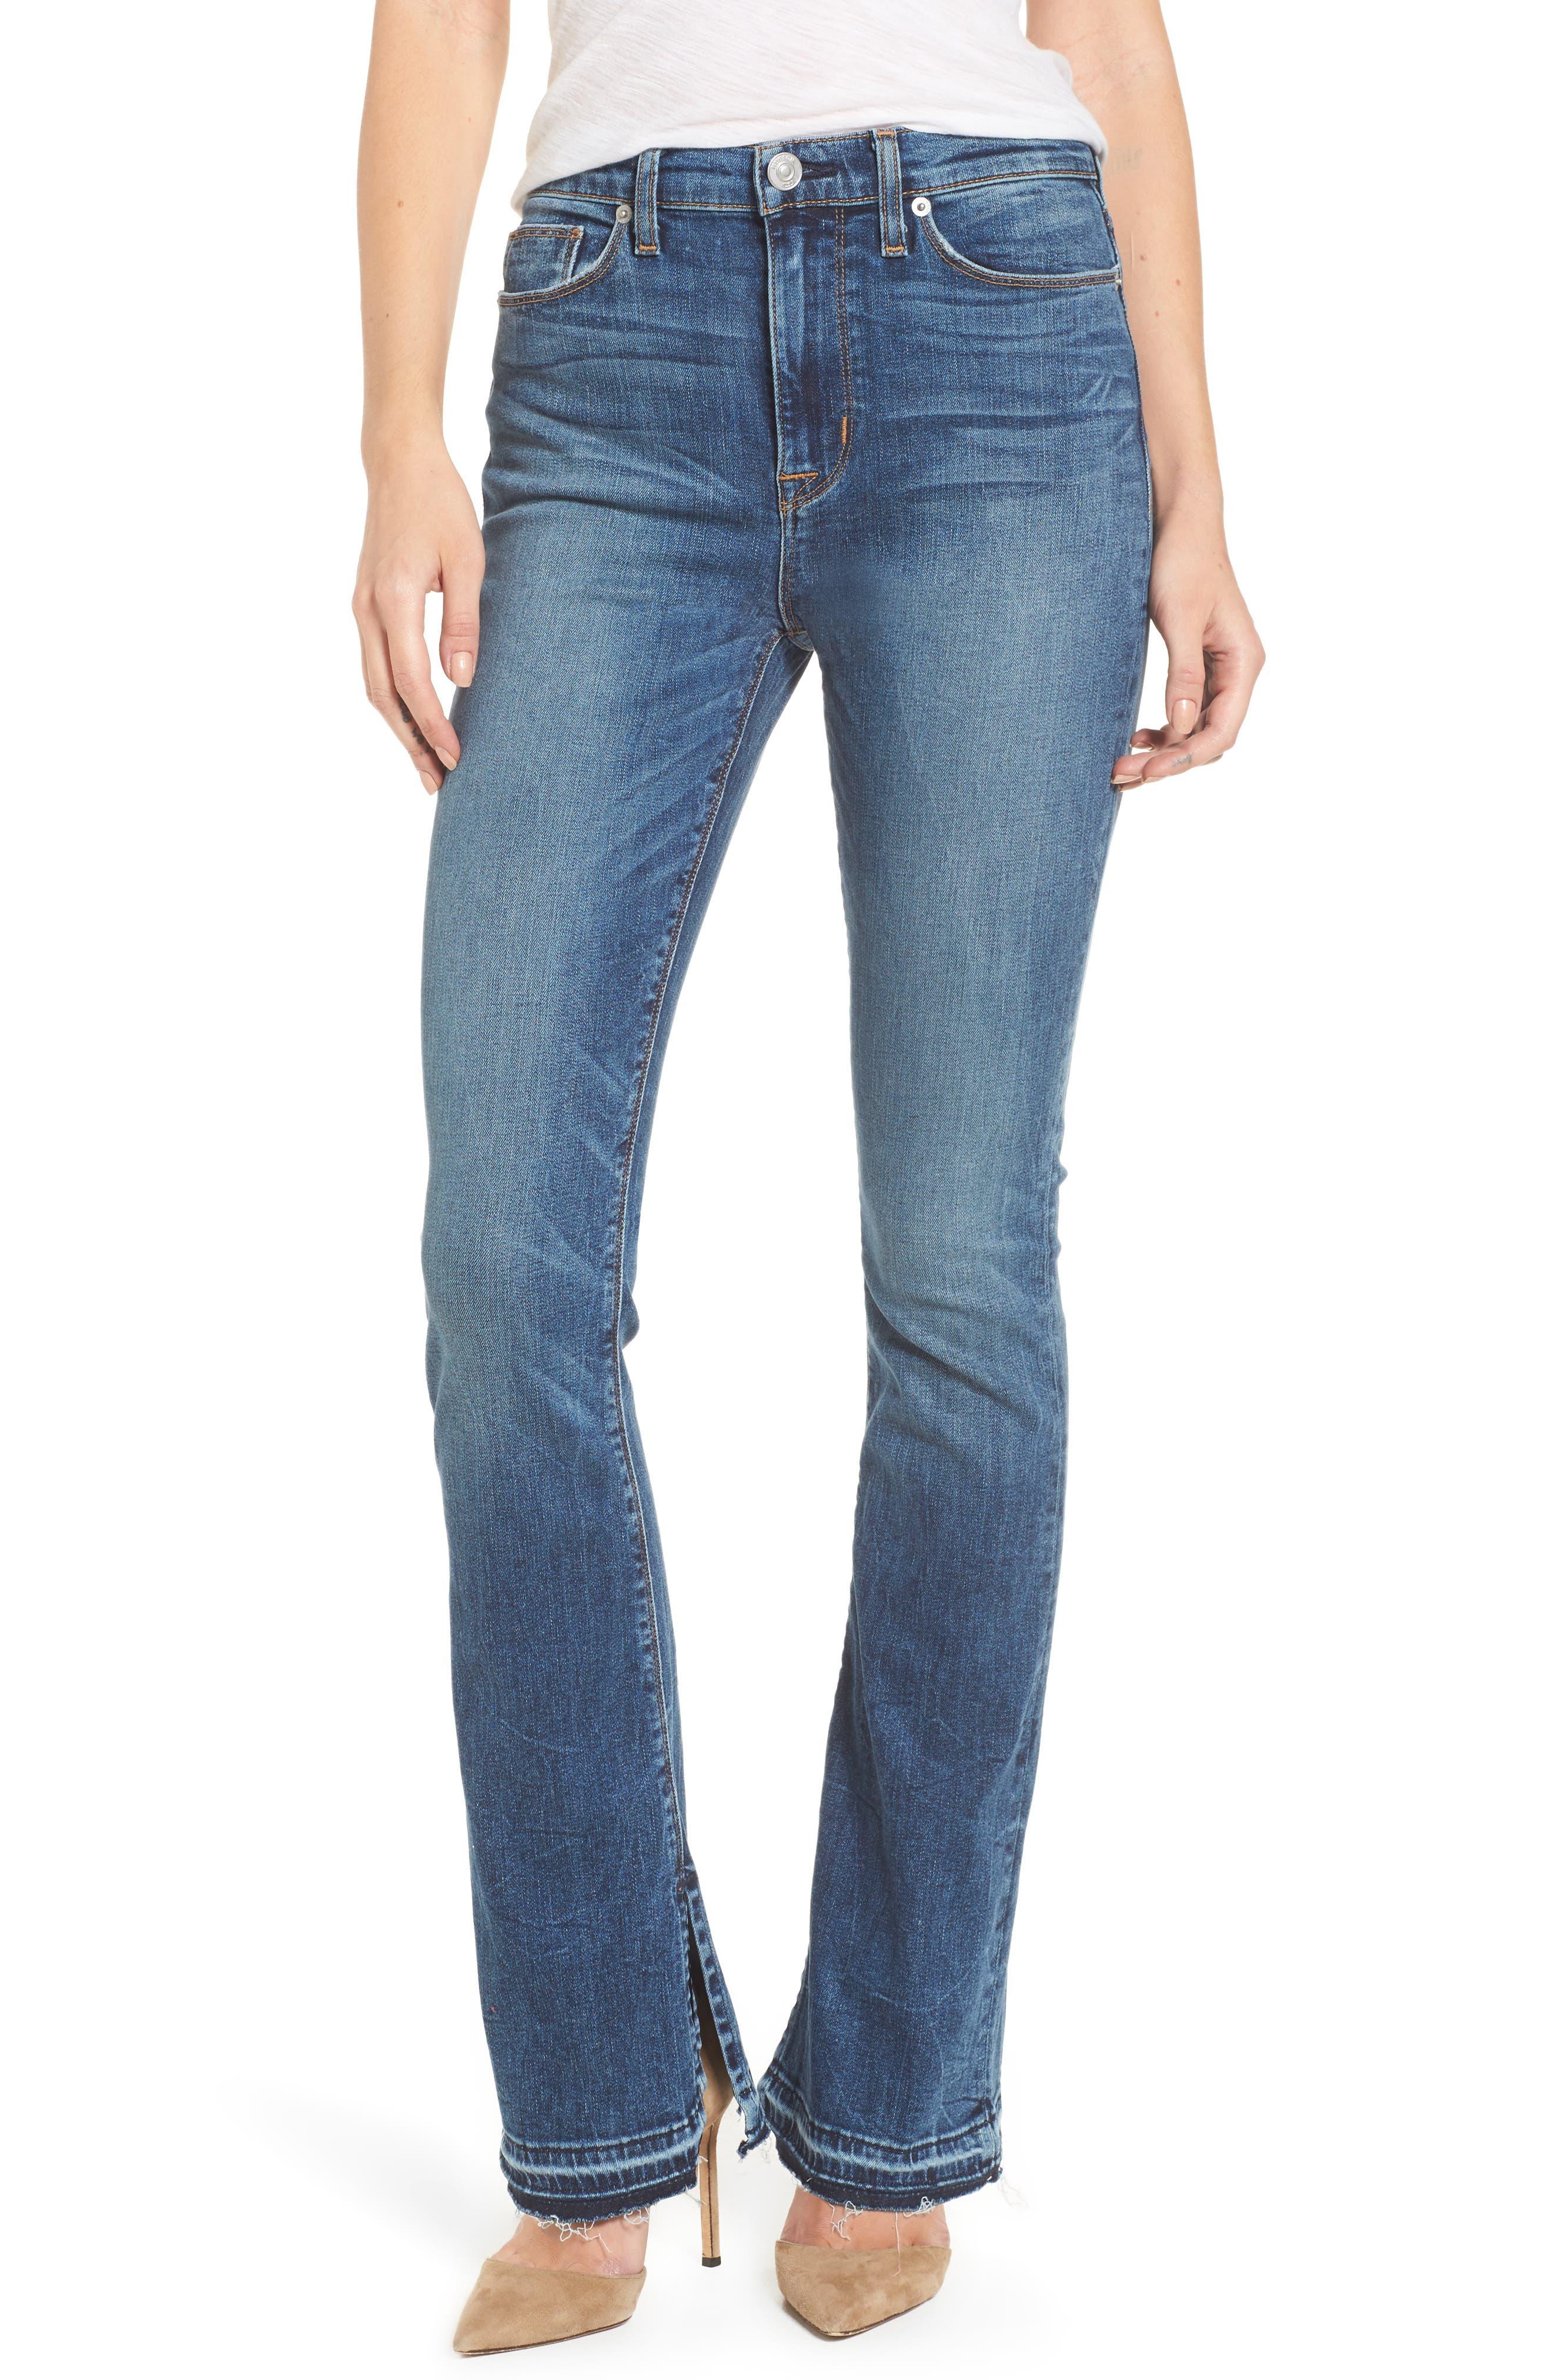 Heartbreaker High Waist Bootcut Jeans,                             Main thumbnail 1, color,                             SPLIT SECOND